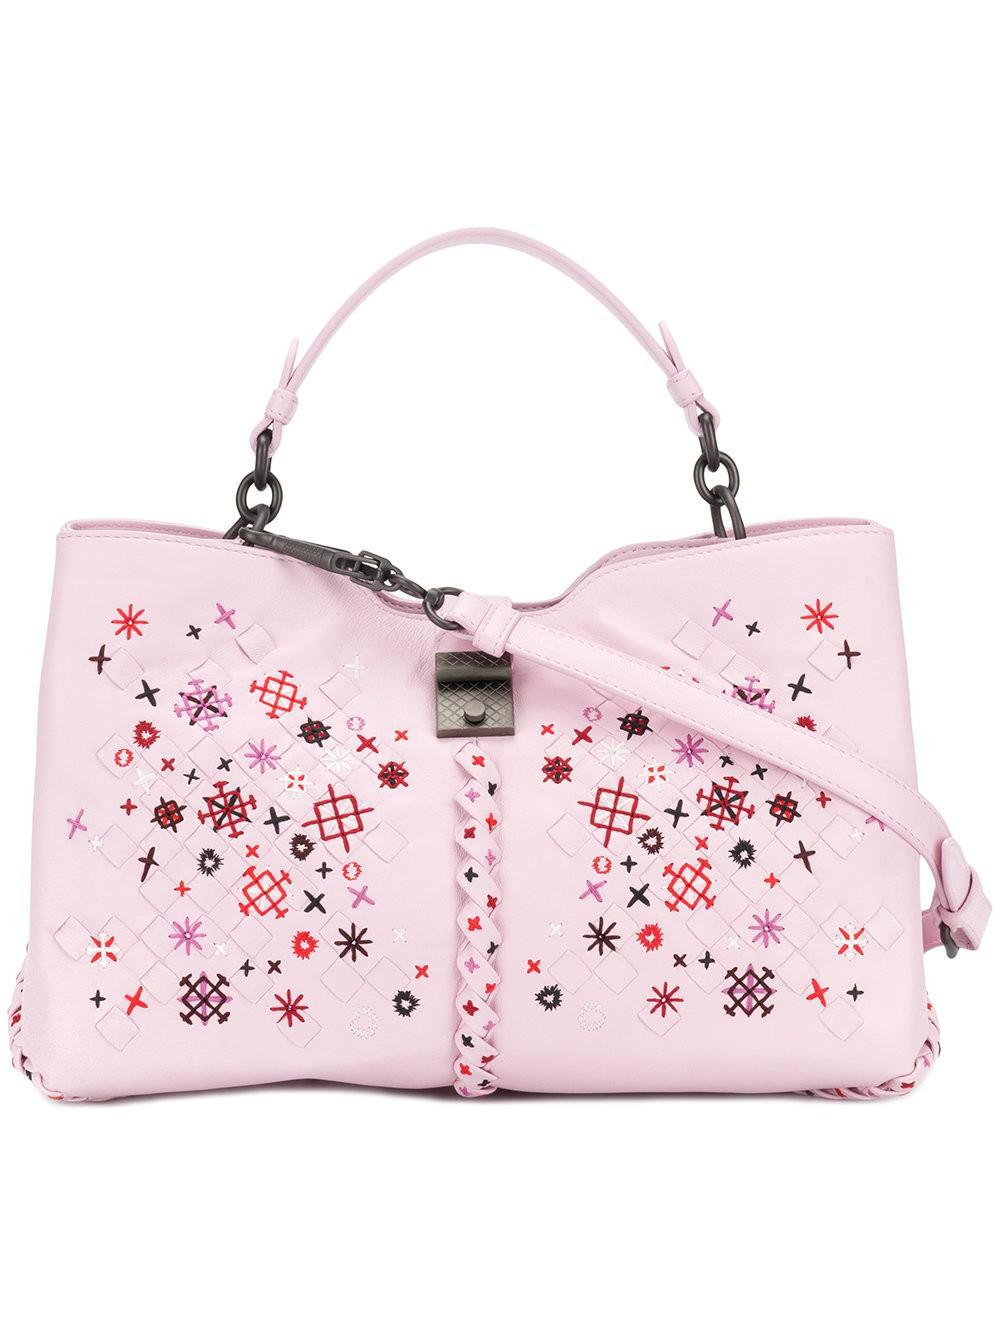 db31ccfe5d Lyst - Bottega Veneta Intrecciato Botanic Embroidered Handbag in Pink